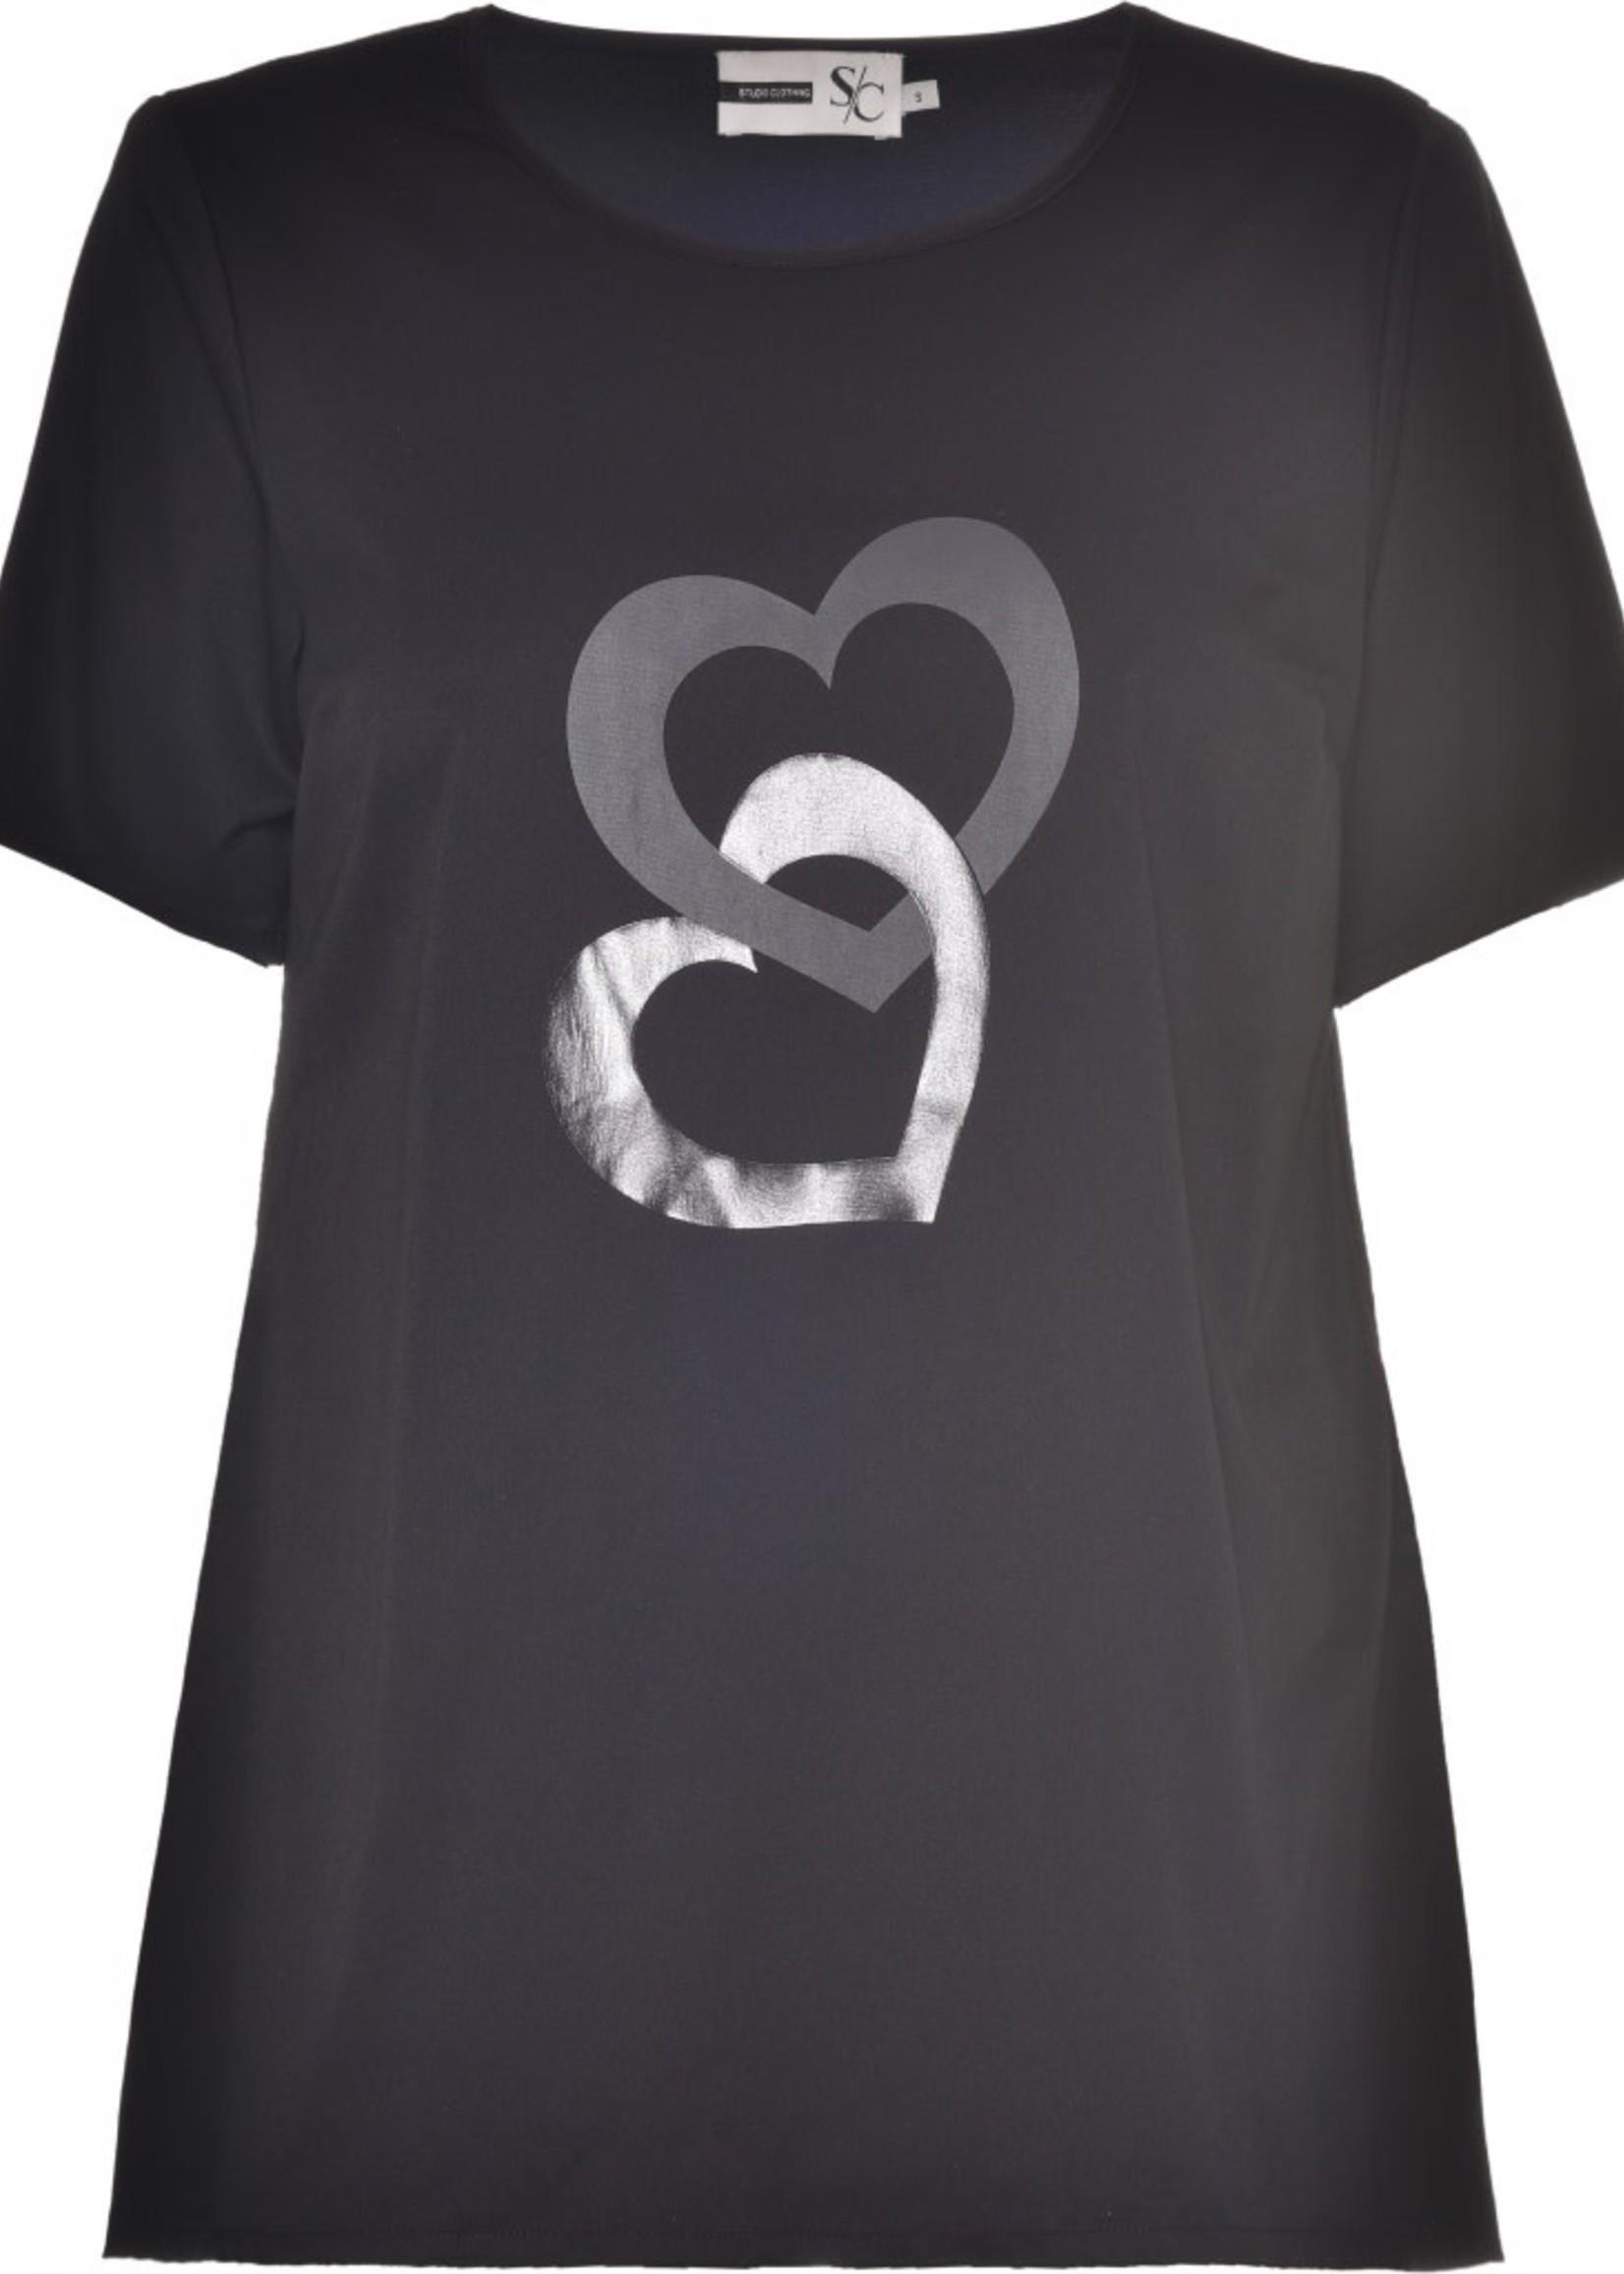 Studio s212883 Nina shirt harten